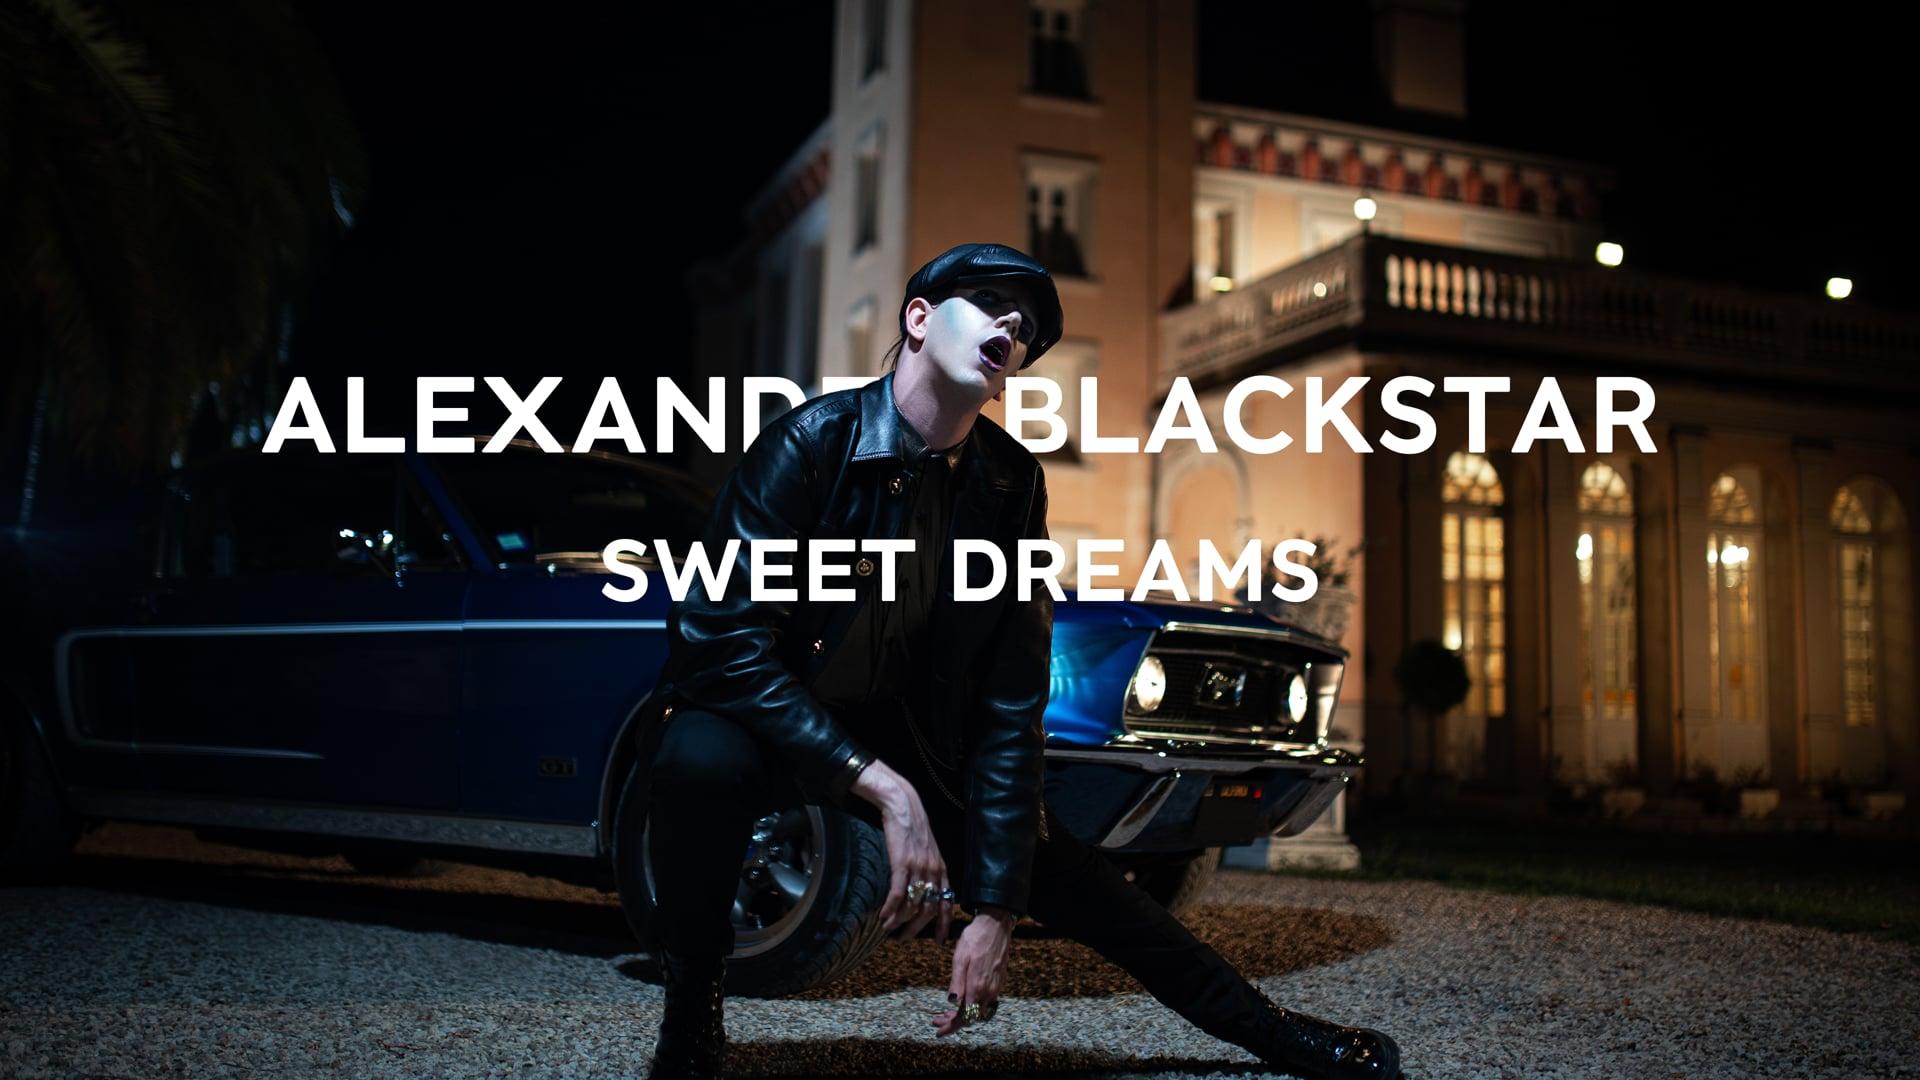 Alexander Blackstar - Sweet Dreams